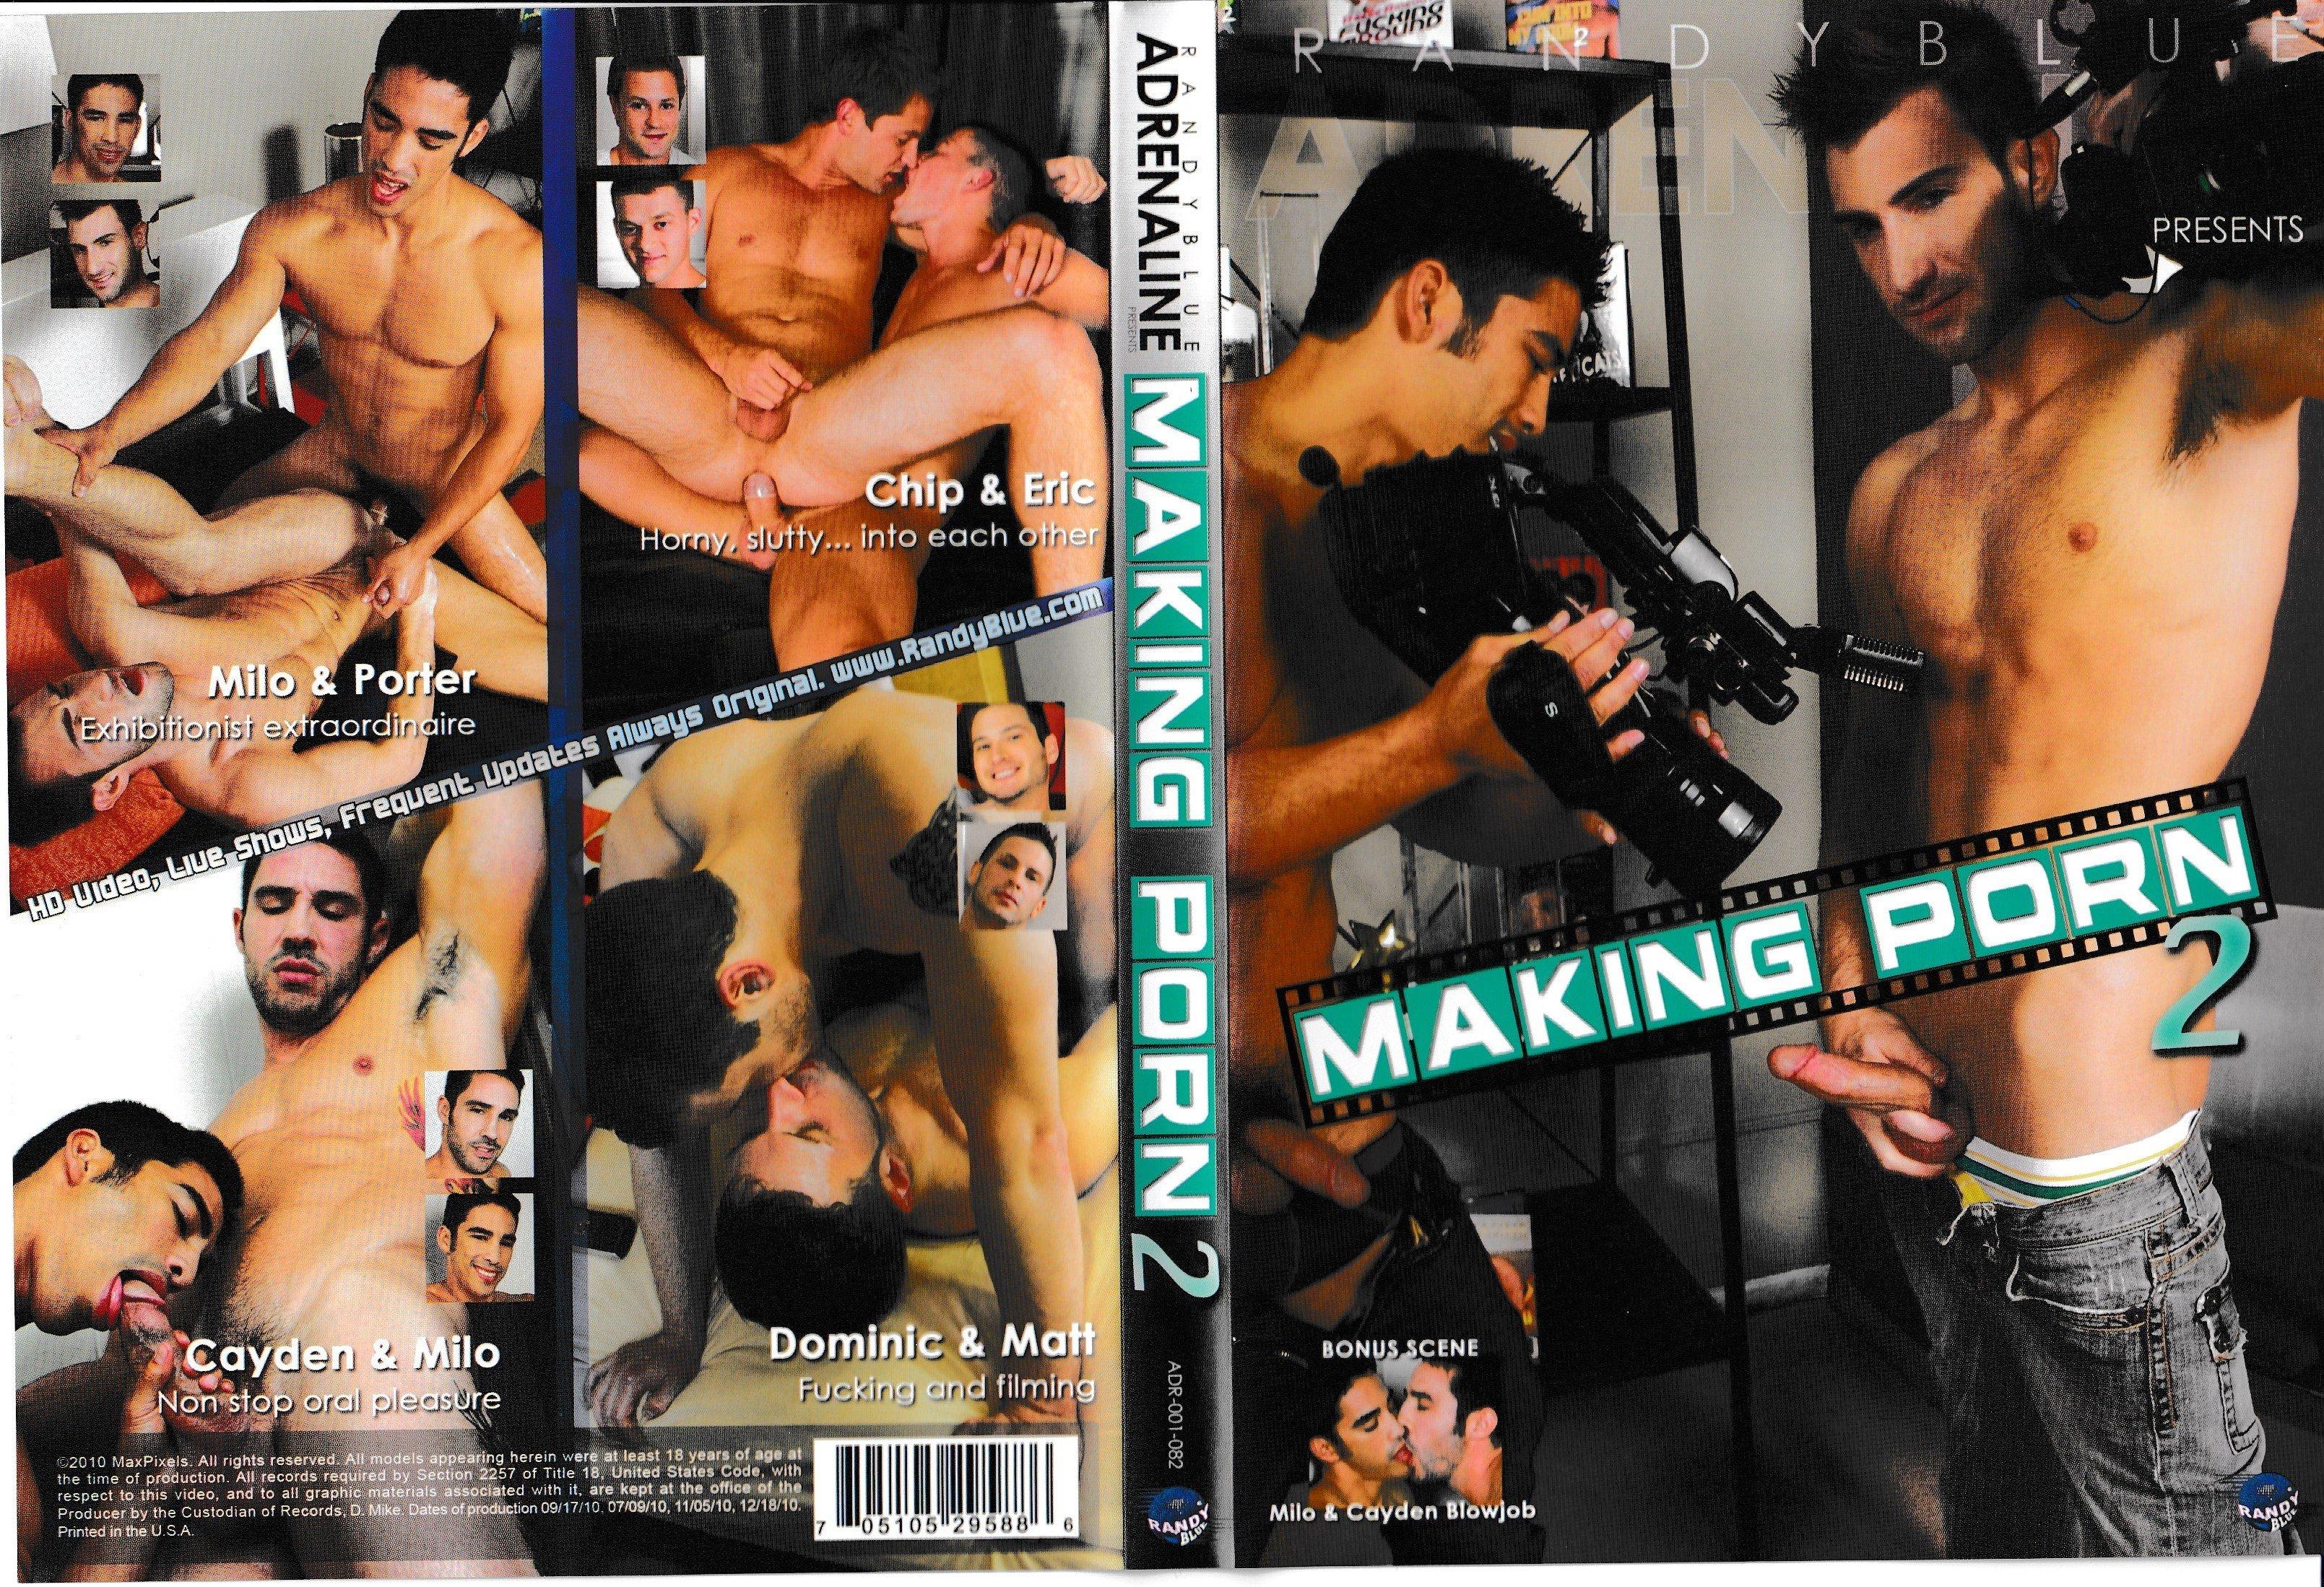 Ch 190: Making porn 2